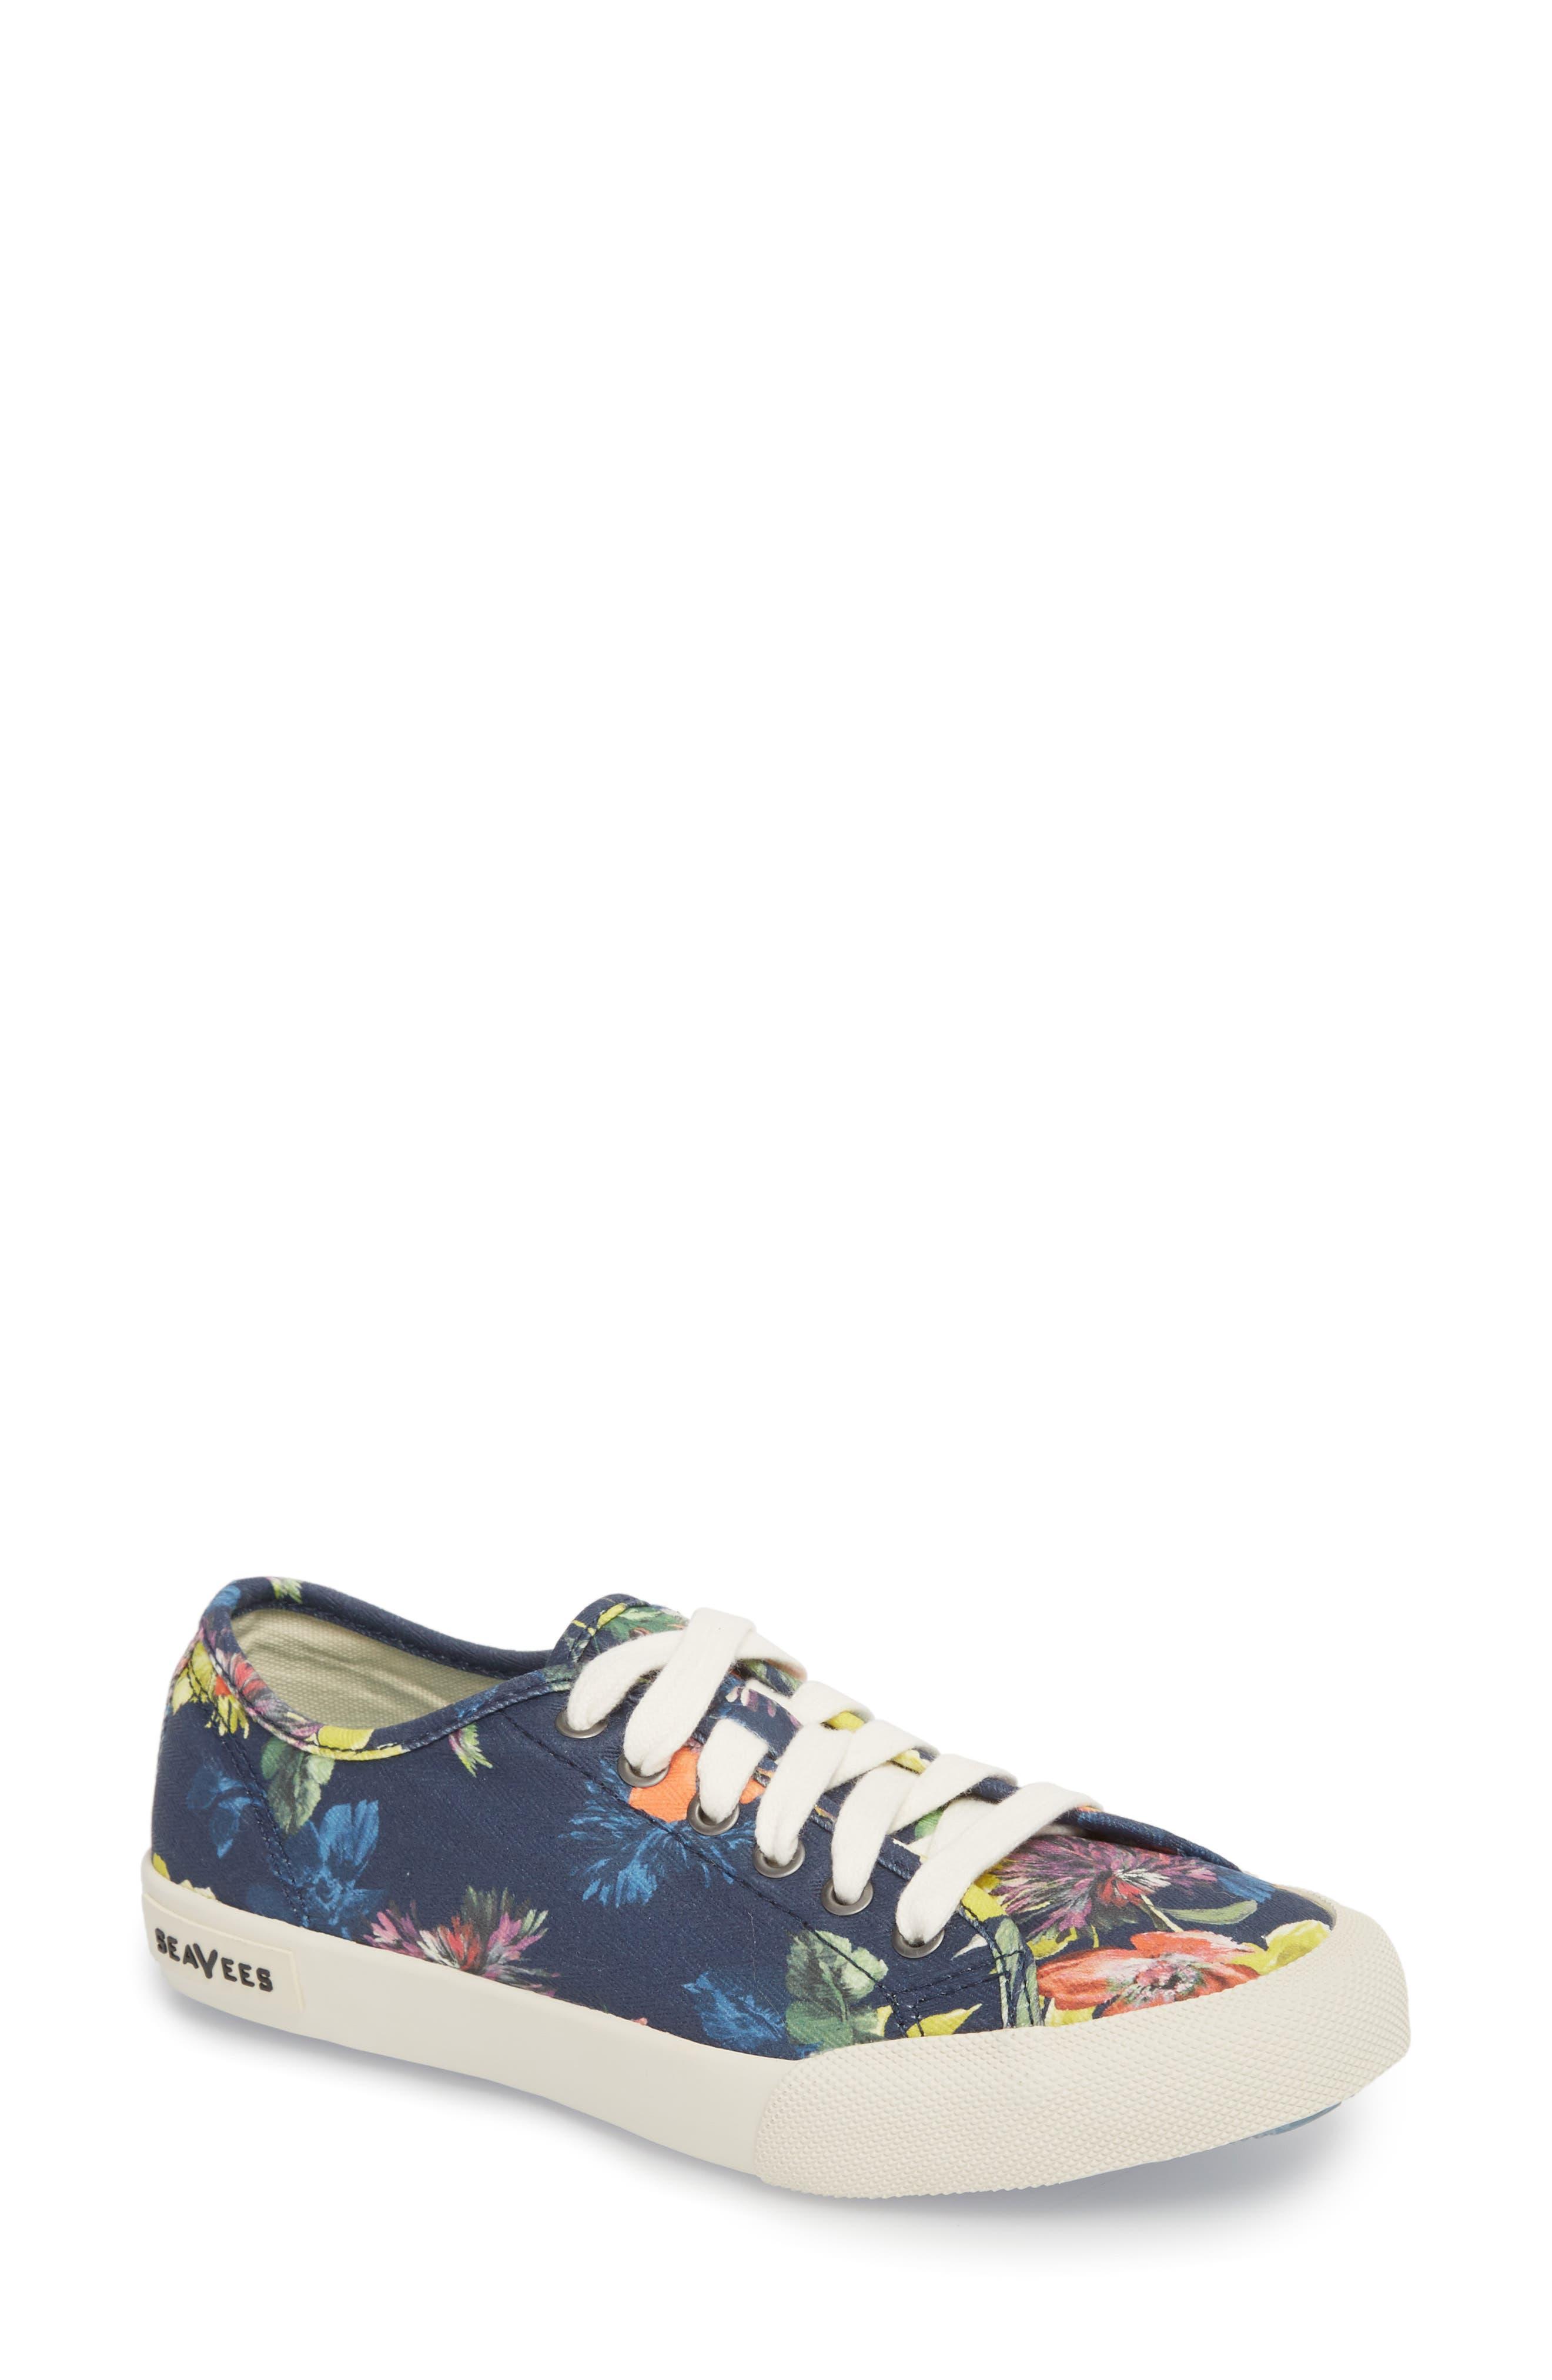 x Trina Turk Monterey Sneaker,                             Main thumbnail 1, color,                             NAVY CHRYSANTHEMUM